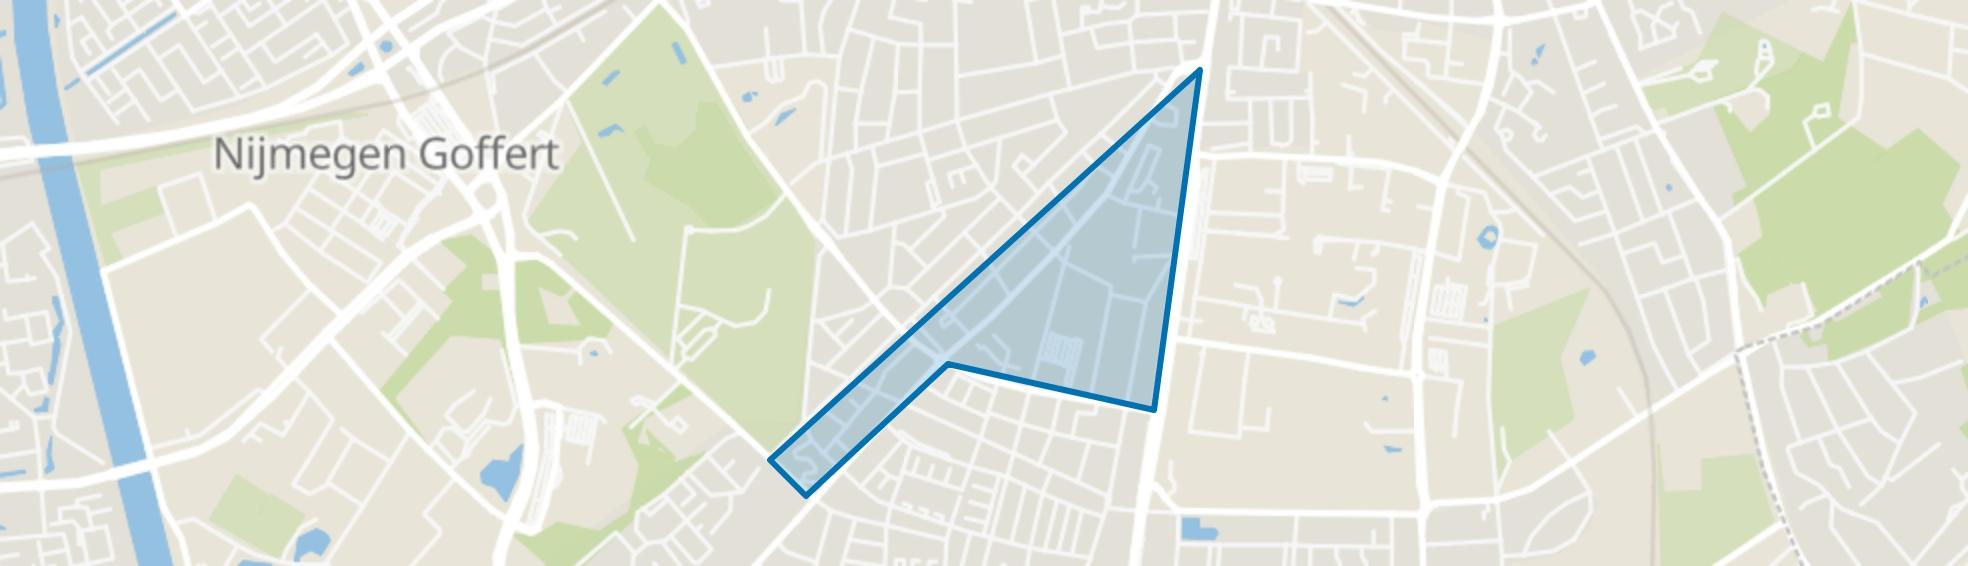 St. Anna, Nijmegen map